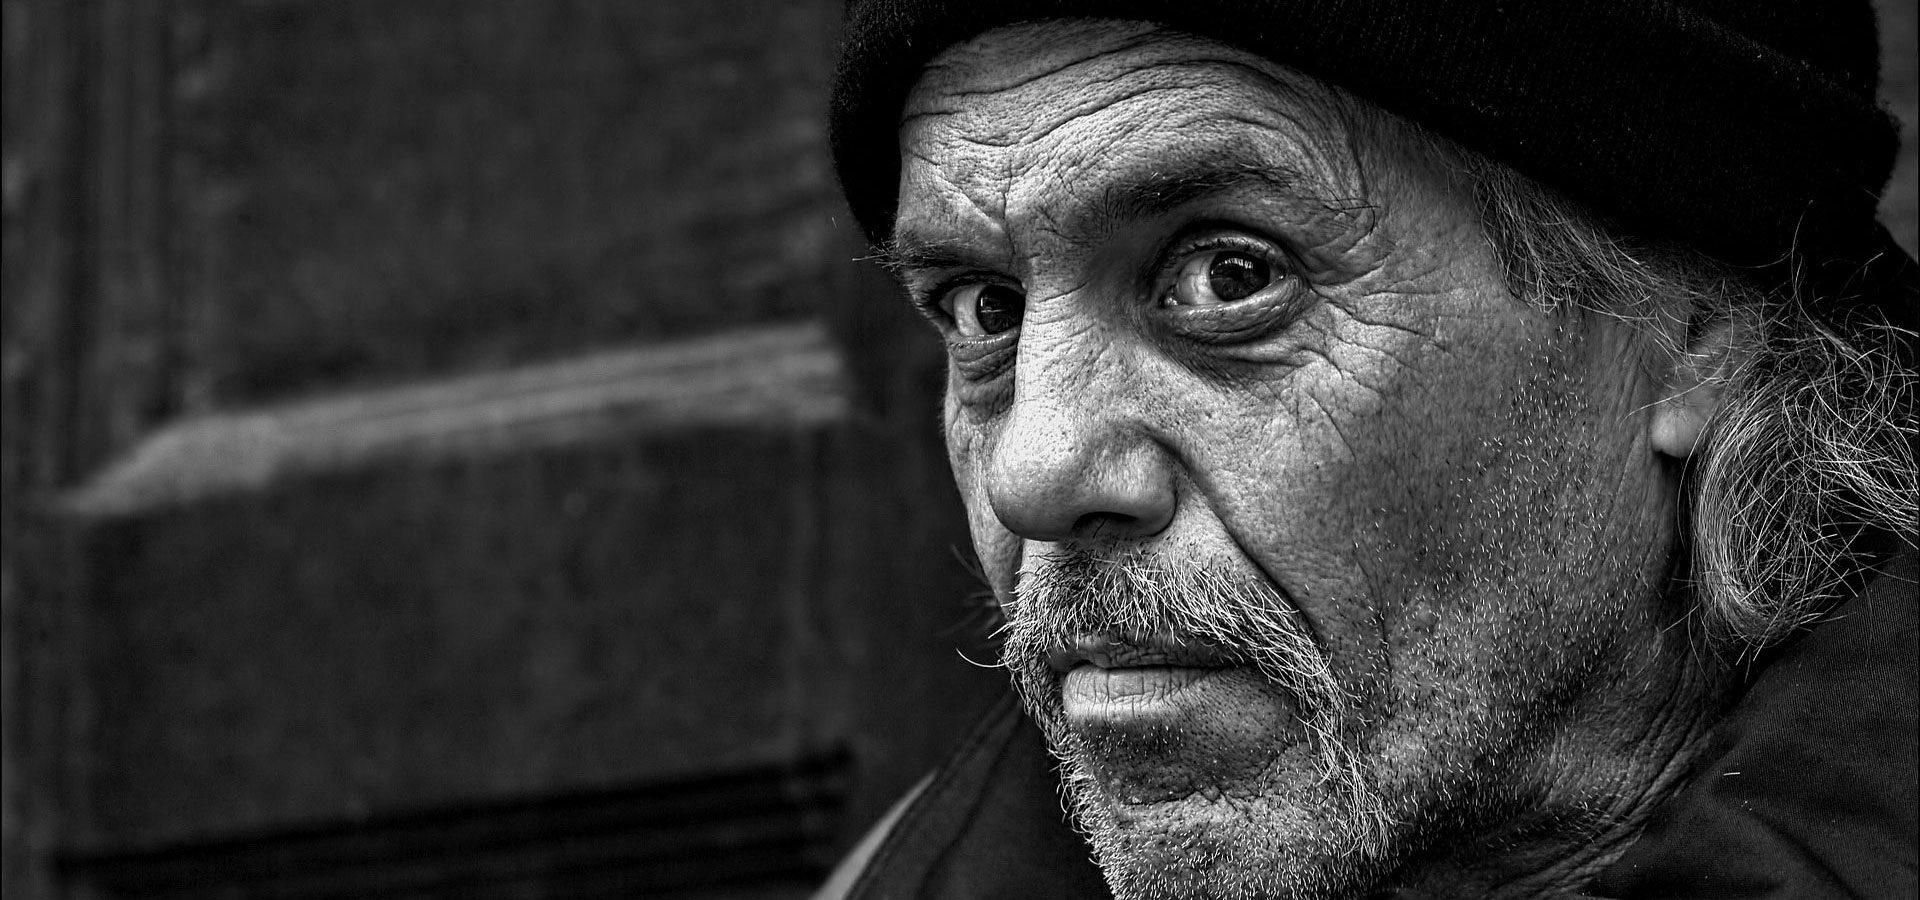 Sortir de la rue dans la dignité